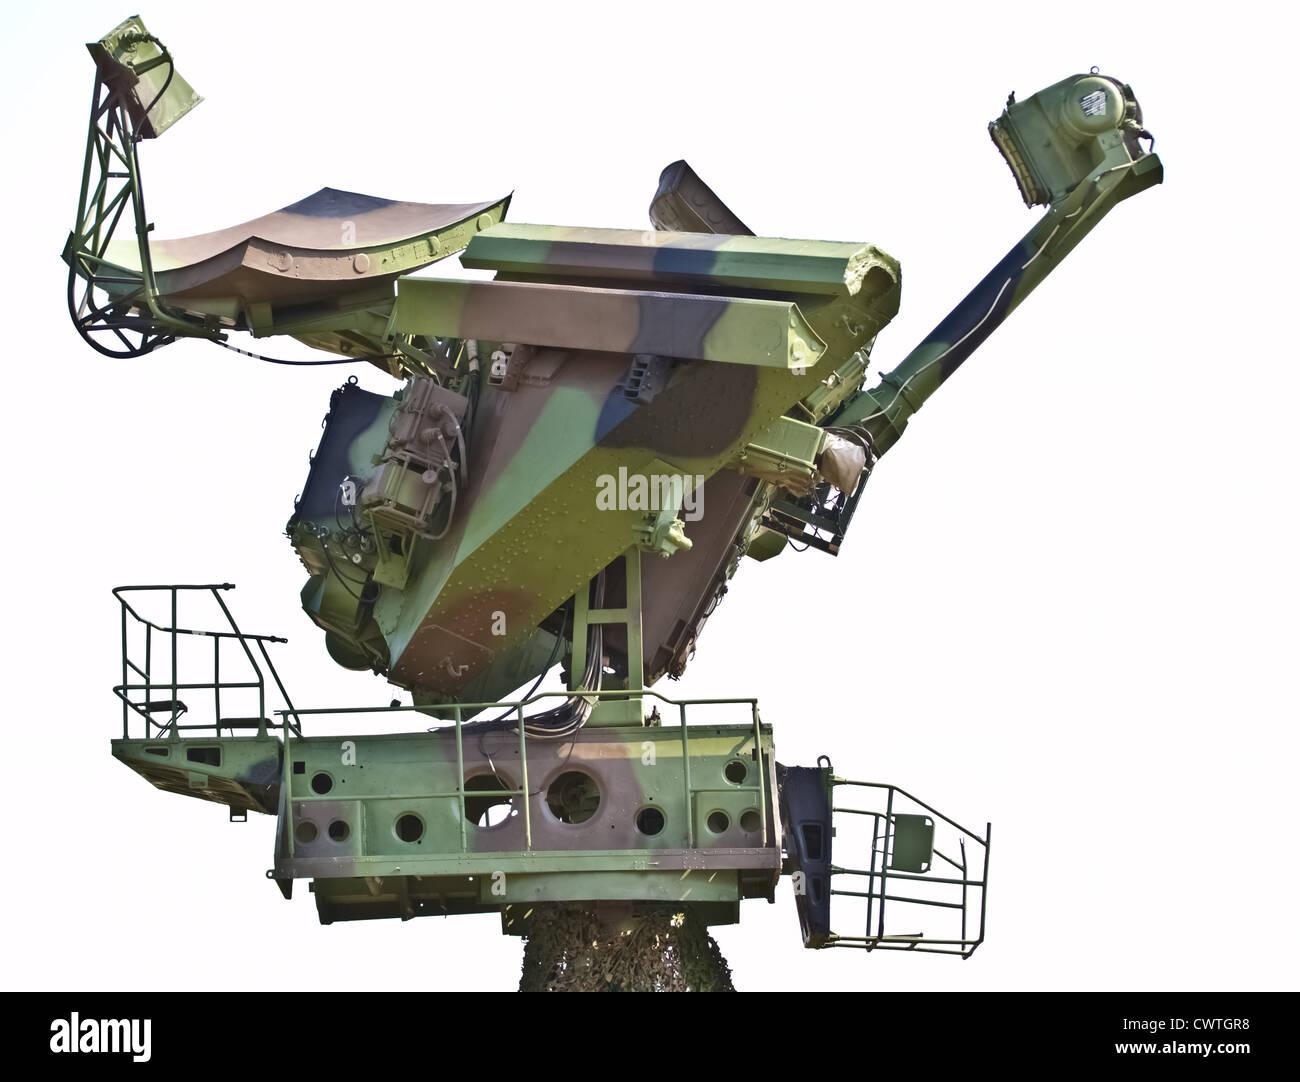 Russian soviet radar with camouflage netting - Stock Image